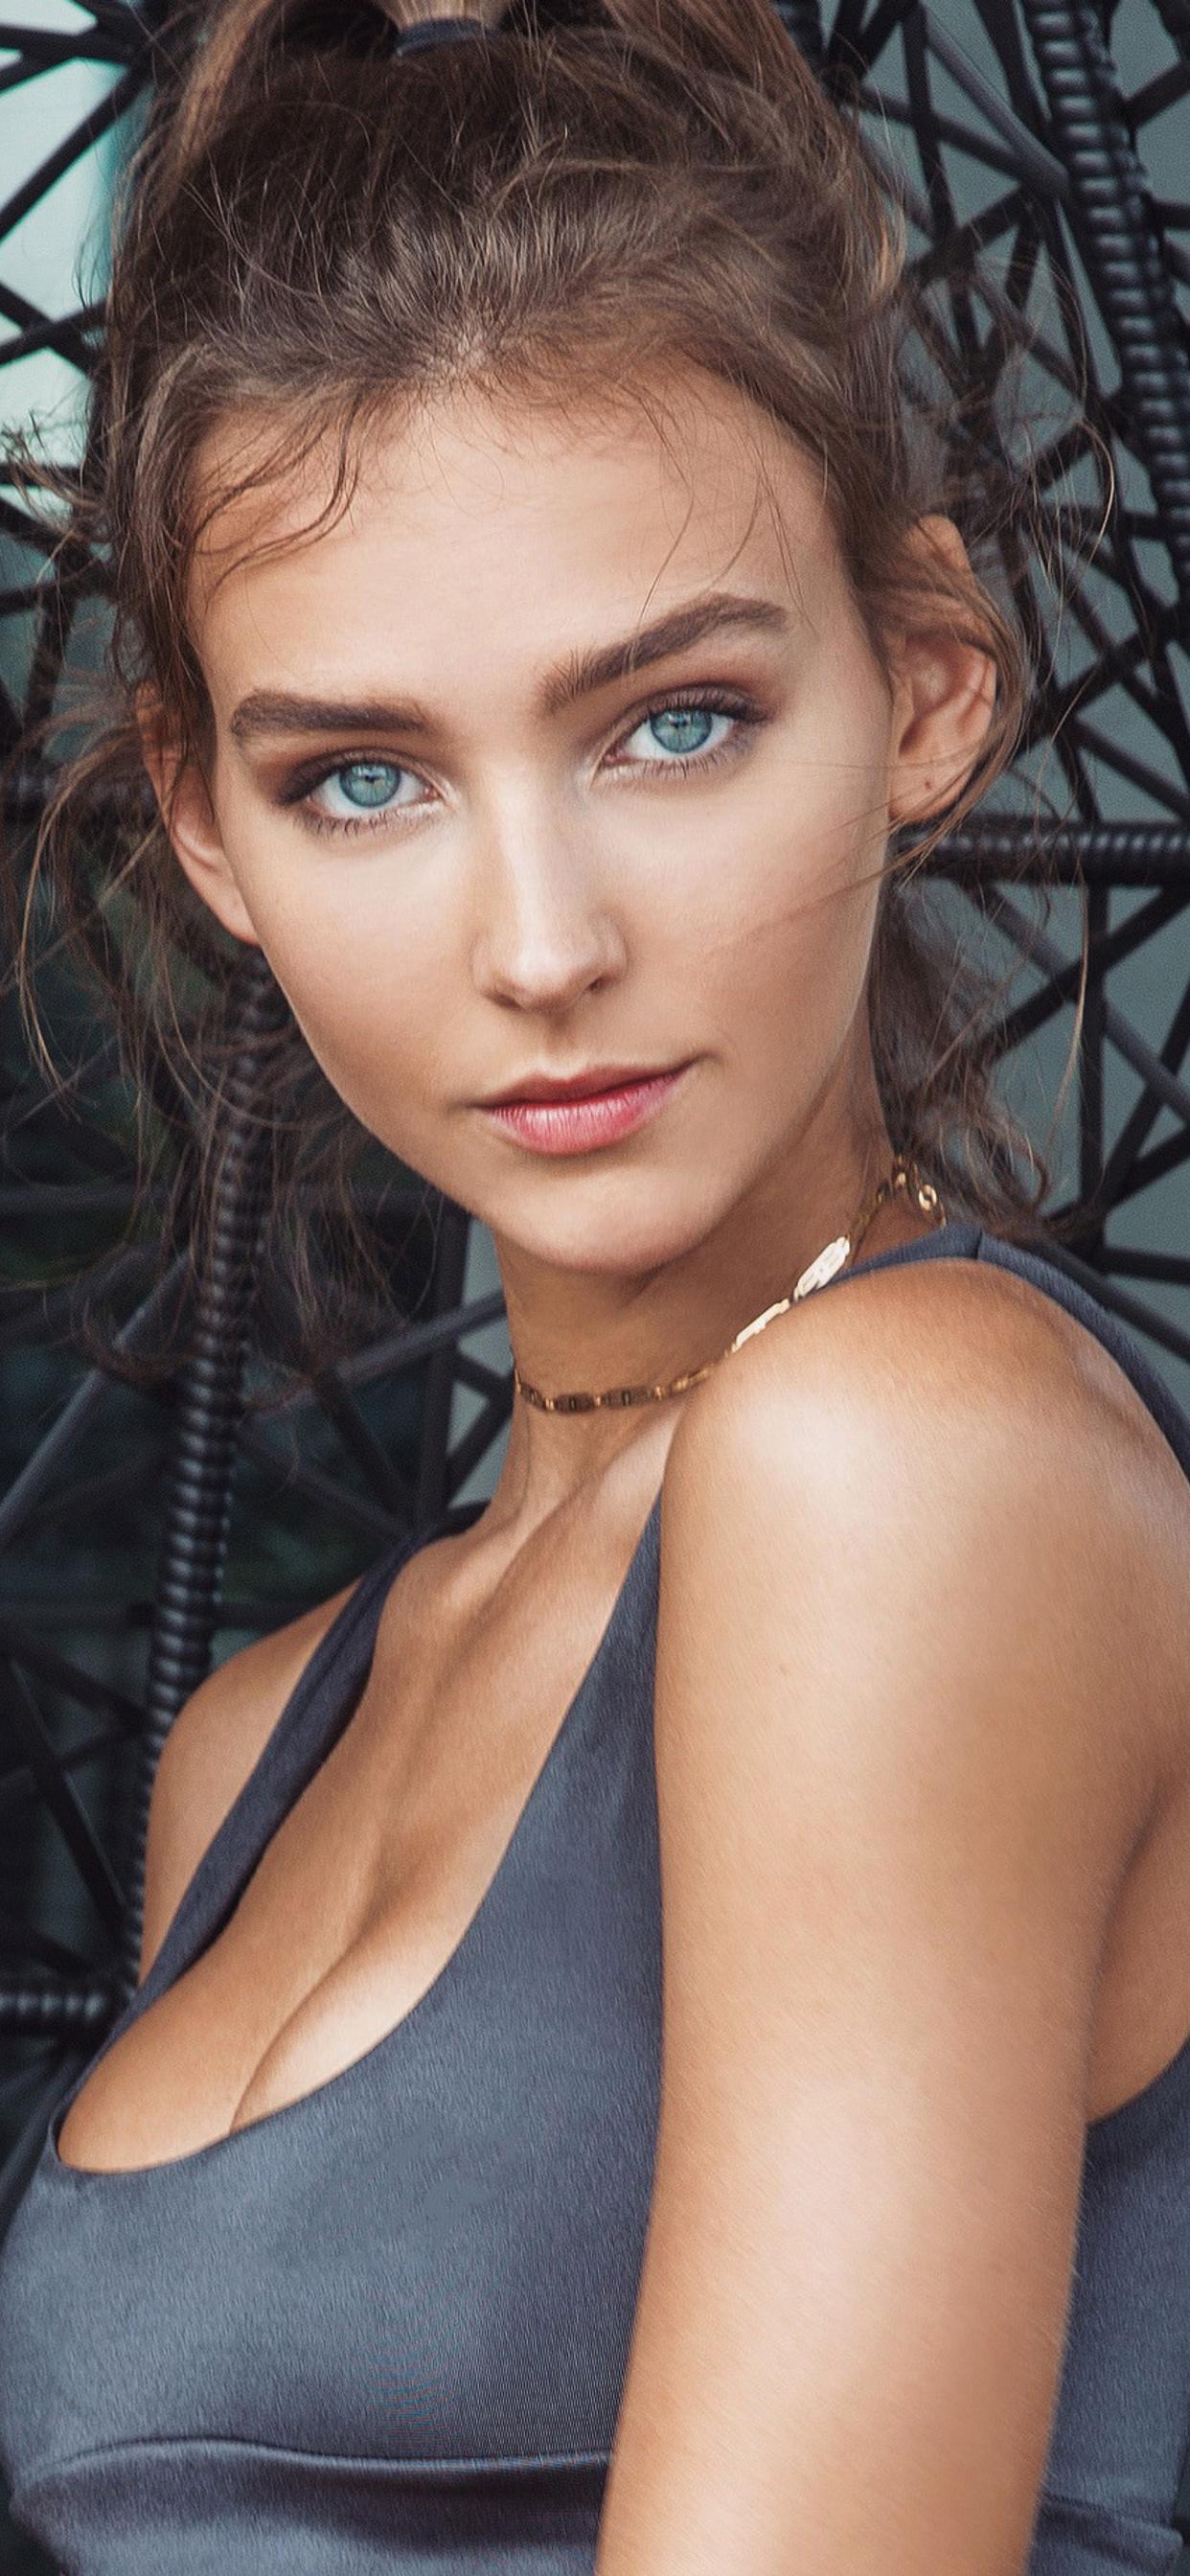 Celebrity Rachel Cook nudes (68 photo), Sexy, Bikini, Selfie, underwear 2018